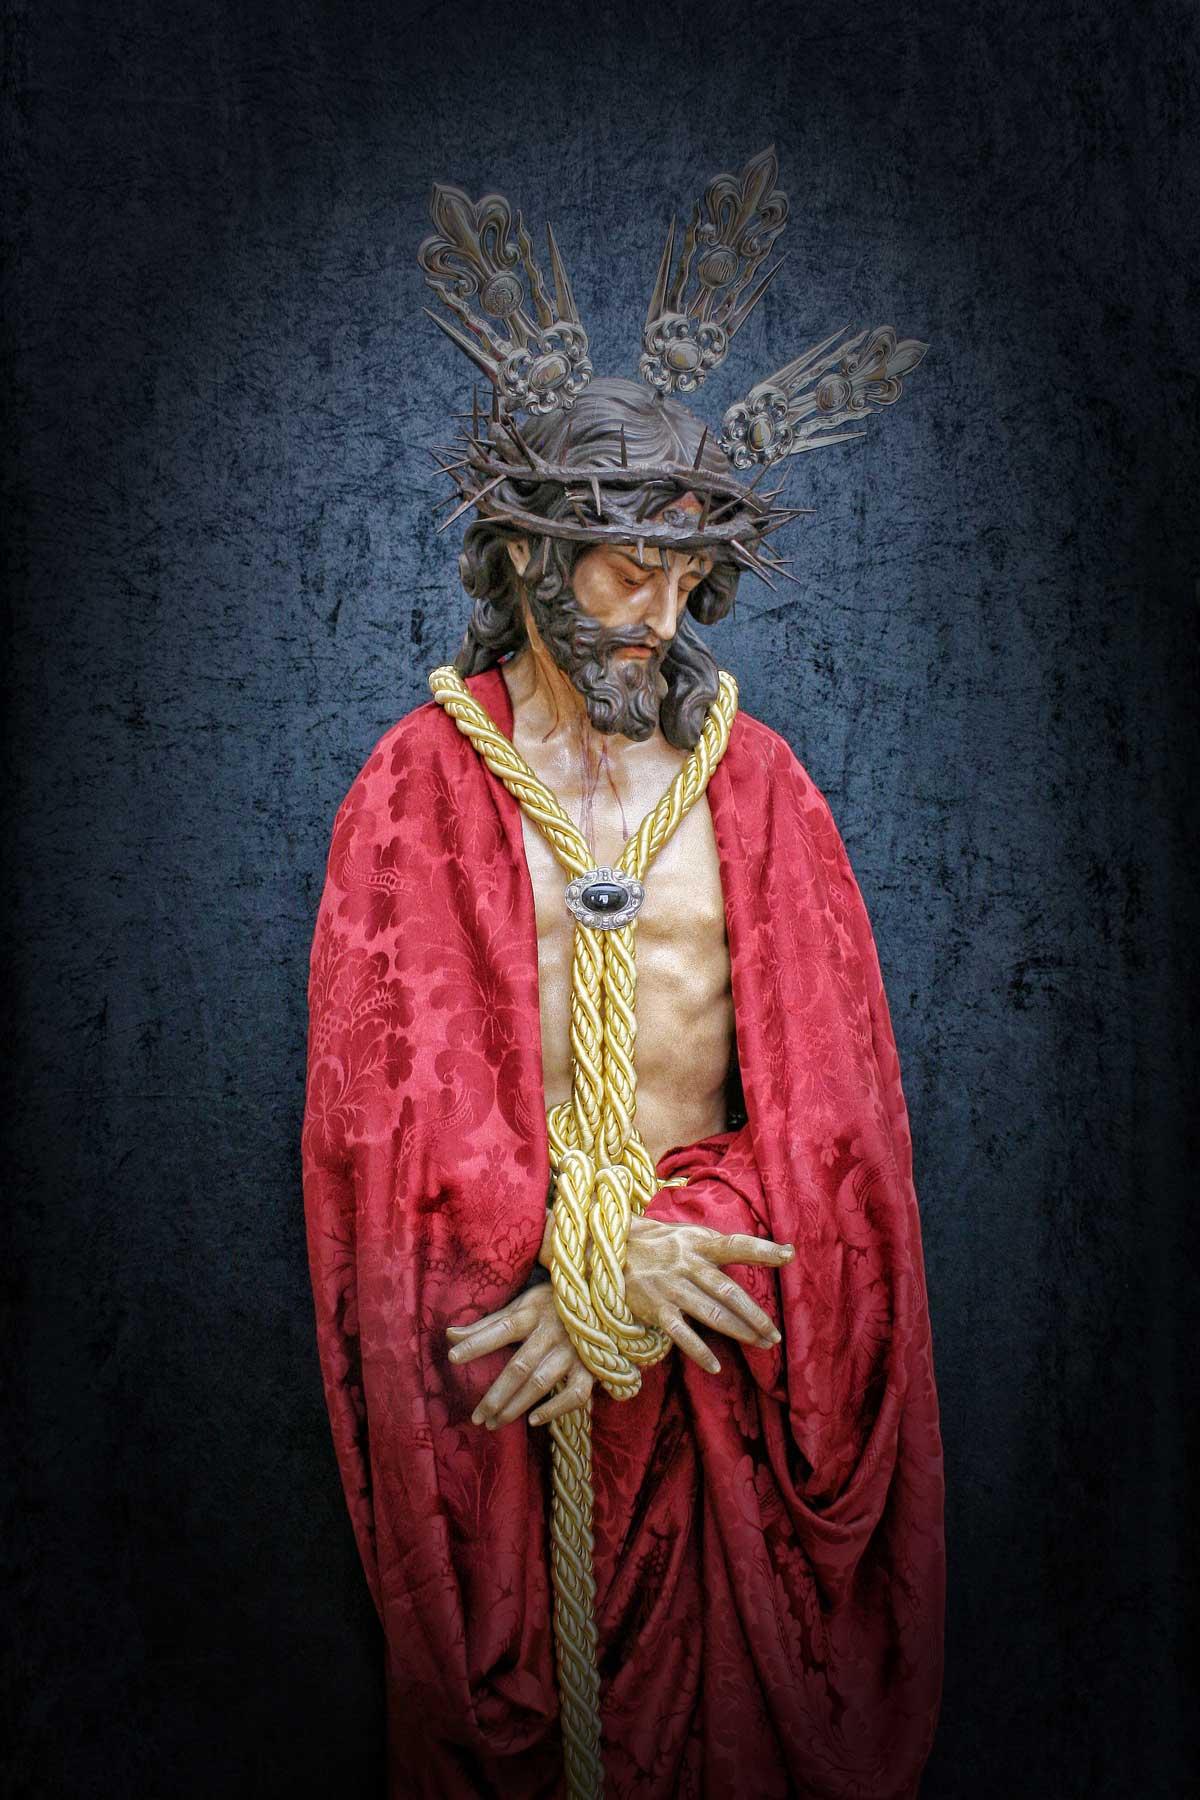 jesus-cautivo-de-villacarrillo-en-jaen-1